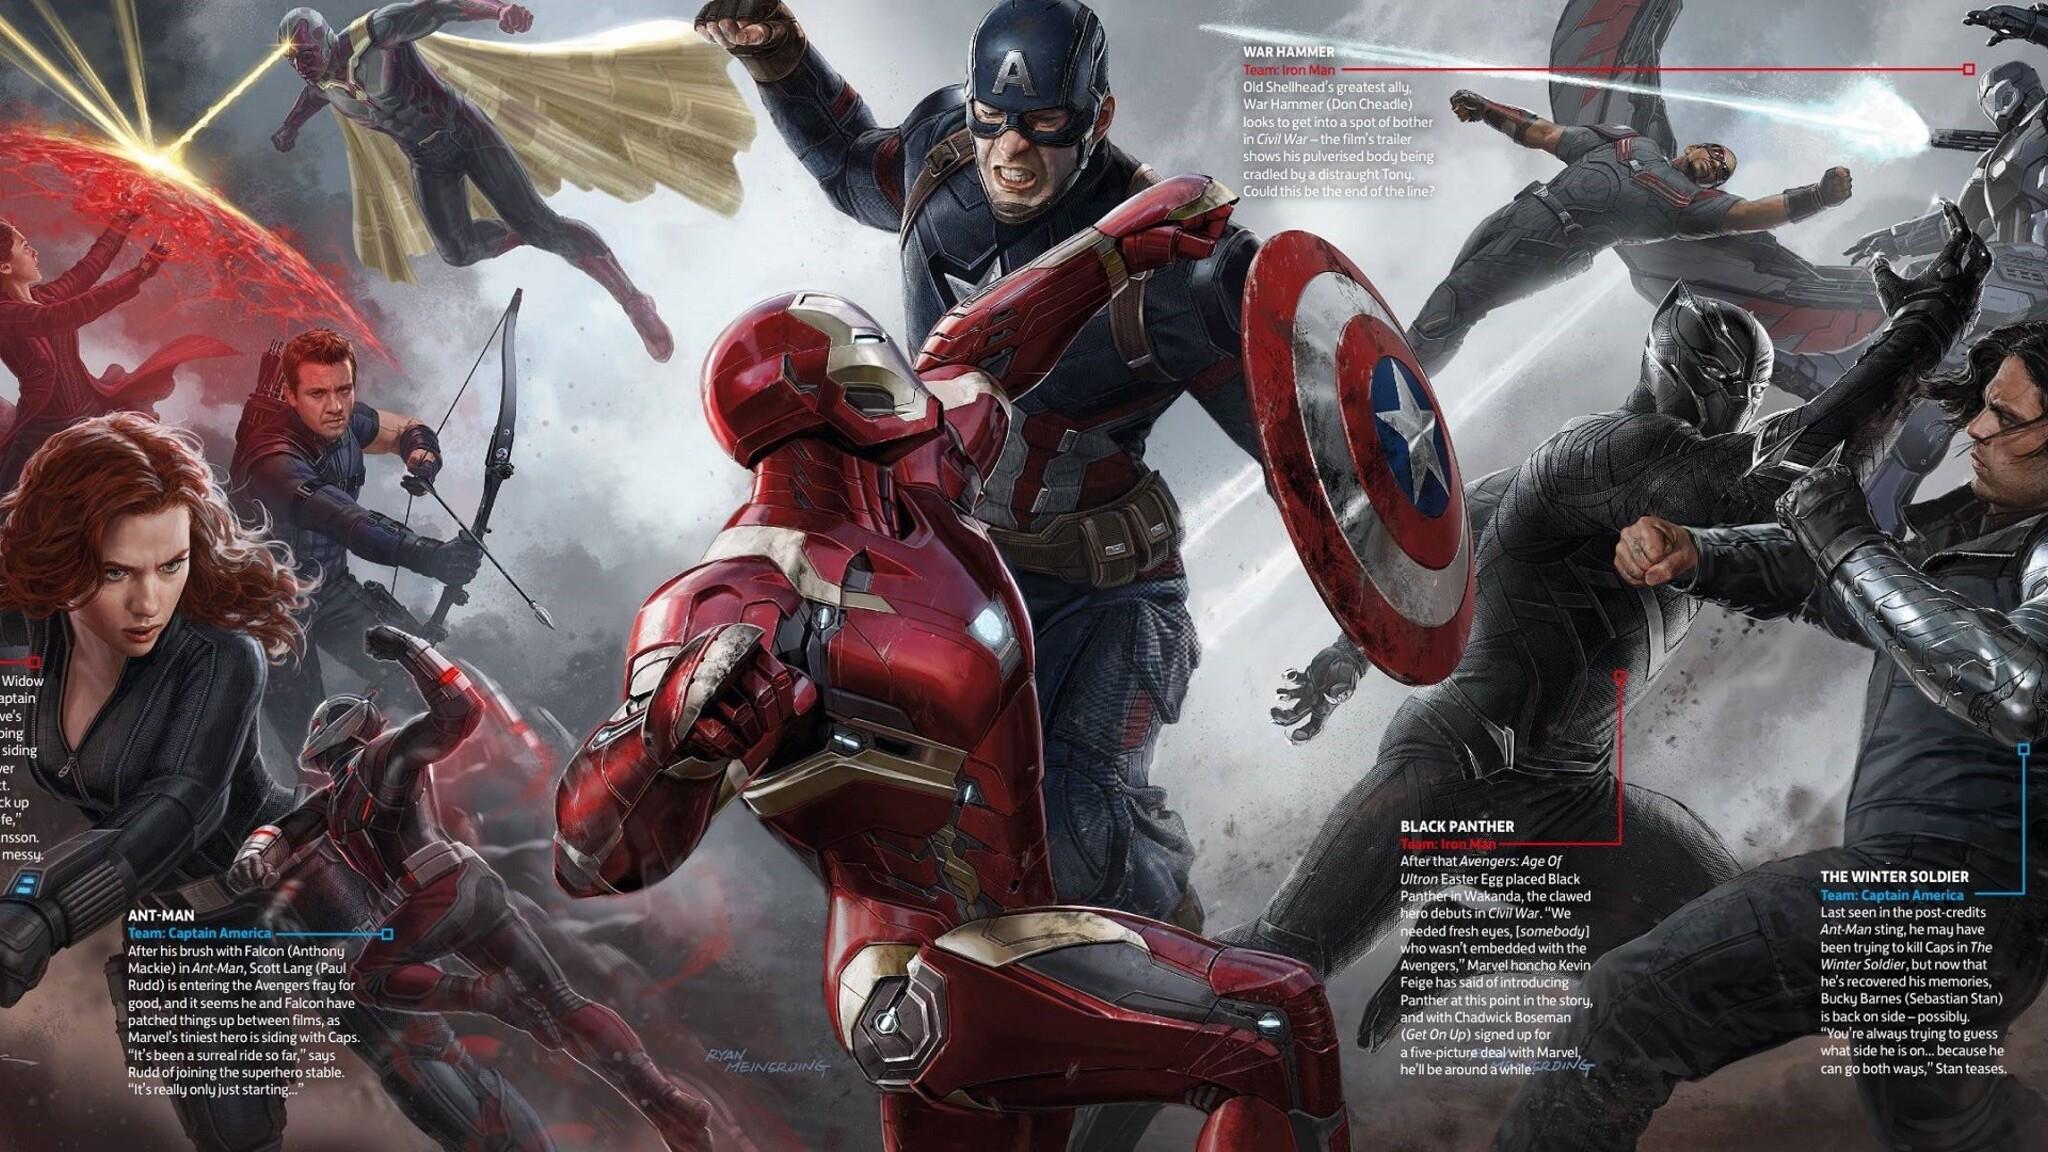 Good Wallpaper Marvel Falcon - captain-america-civil-war-heroes-image-2048x1152  2018_52050.jpg